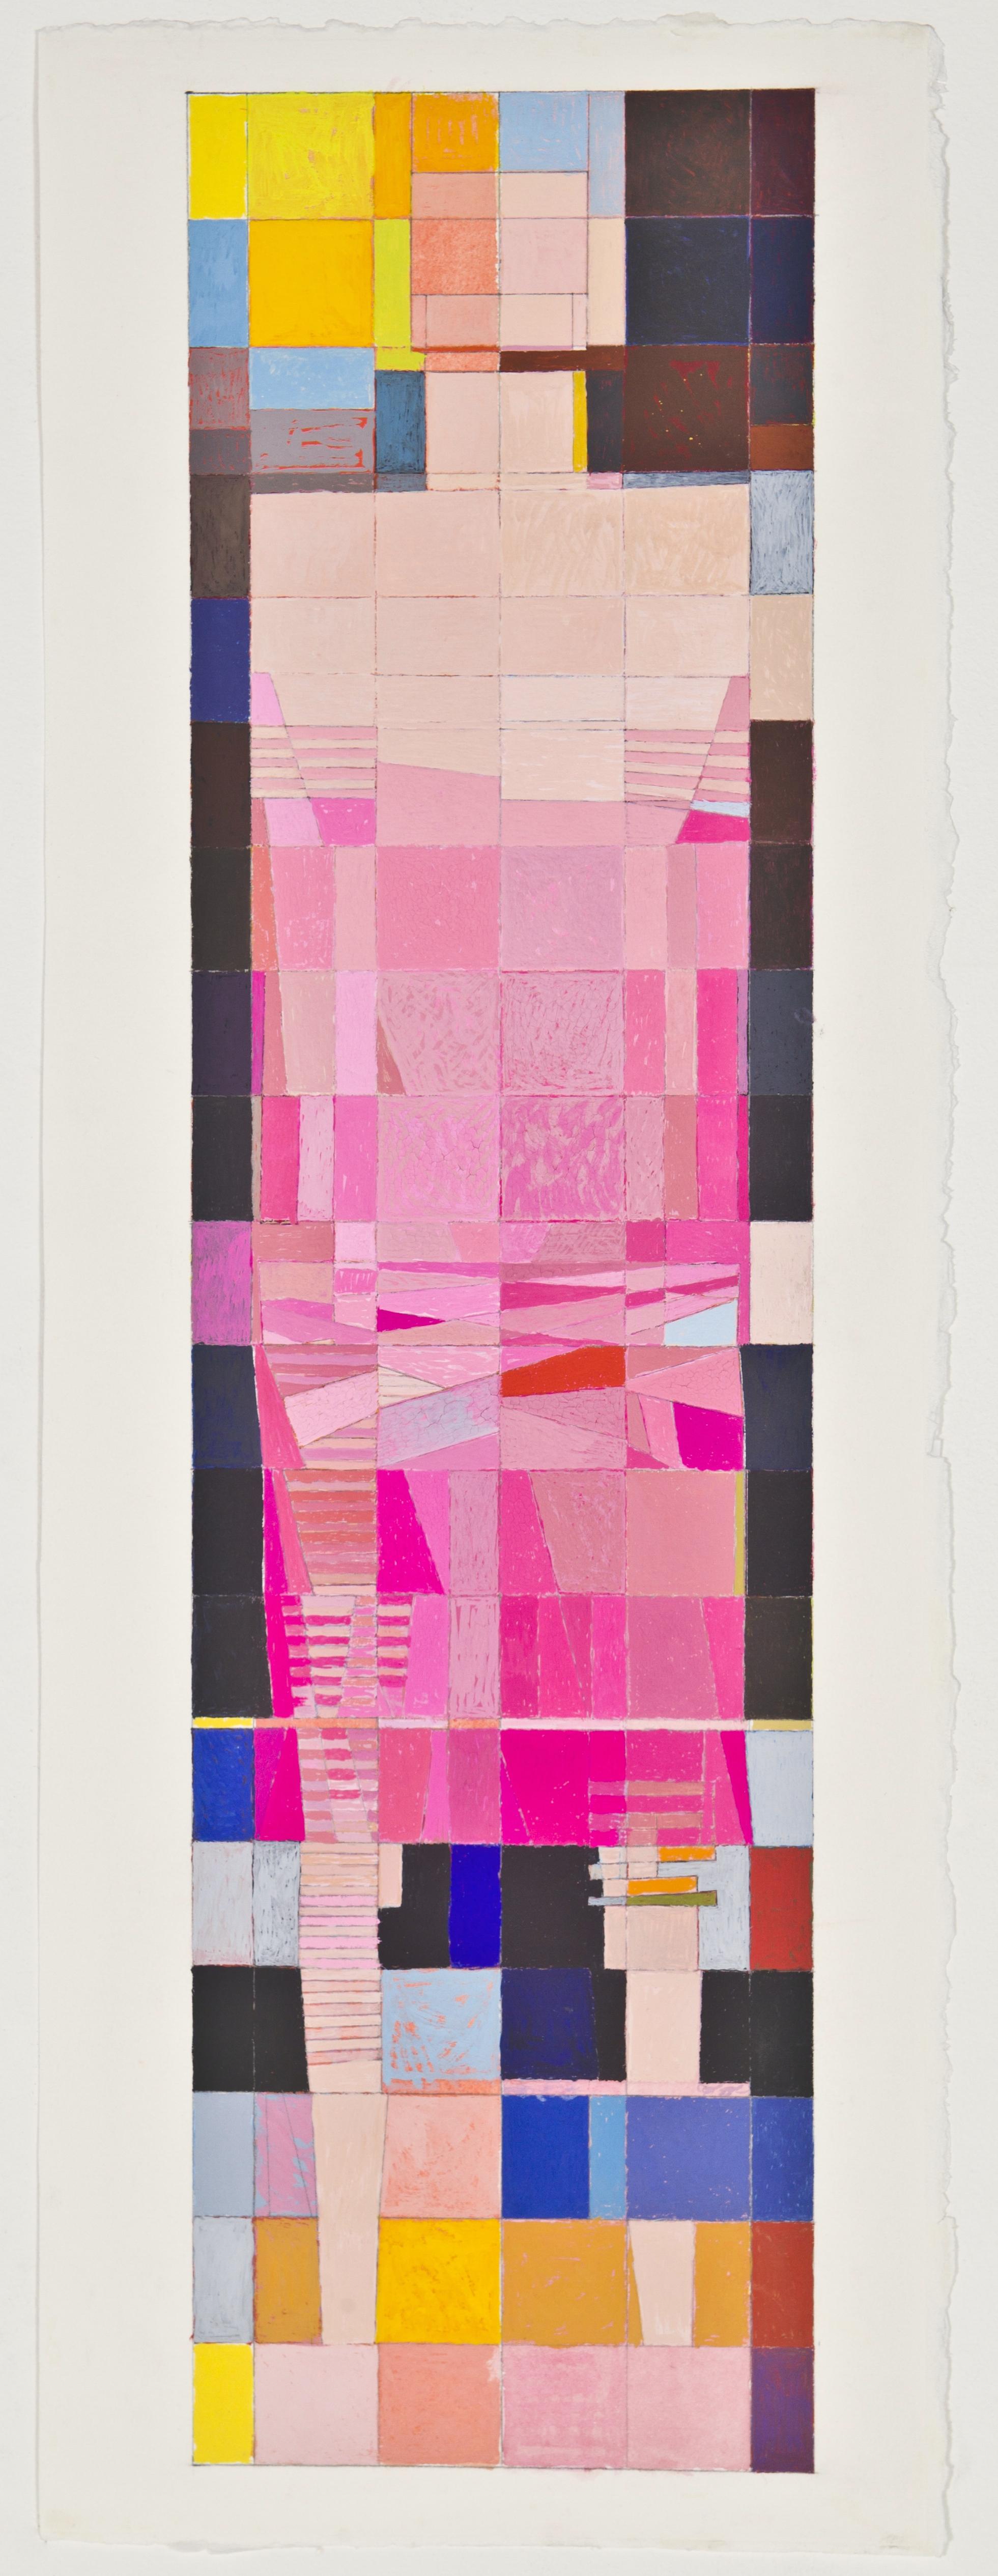 "Dress, 2012, gouache on paper, 28 1/2""x7 3/8"""